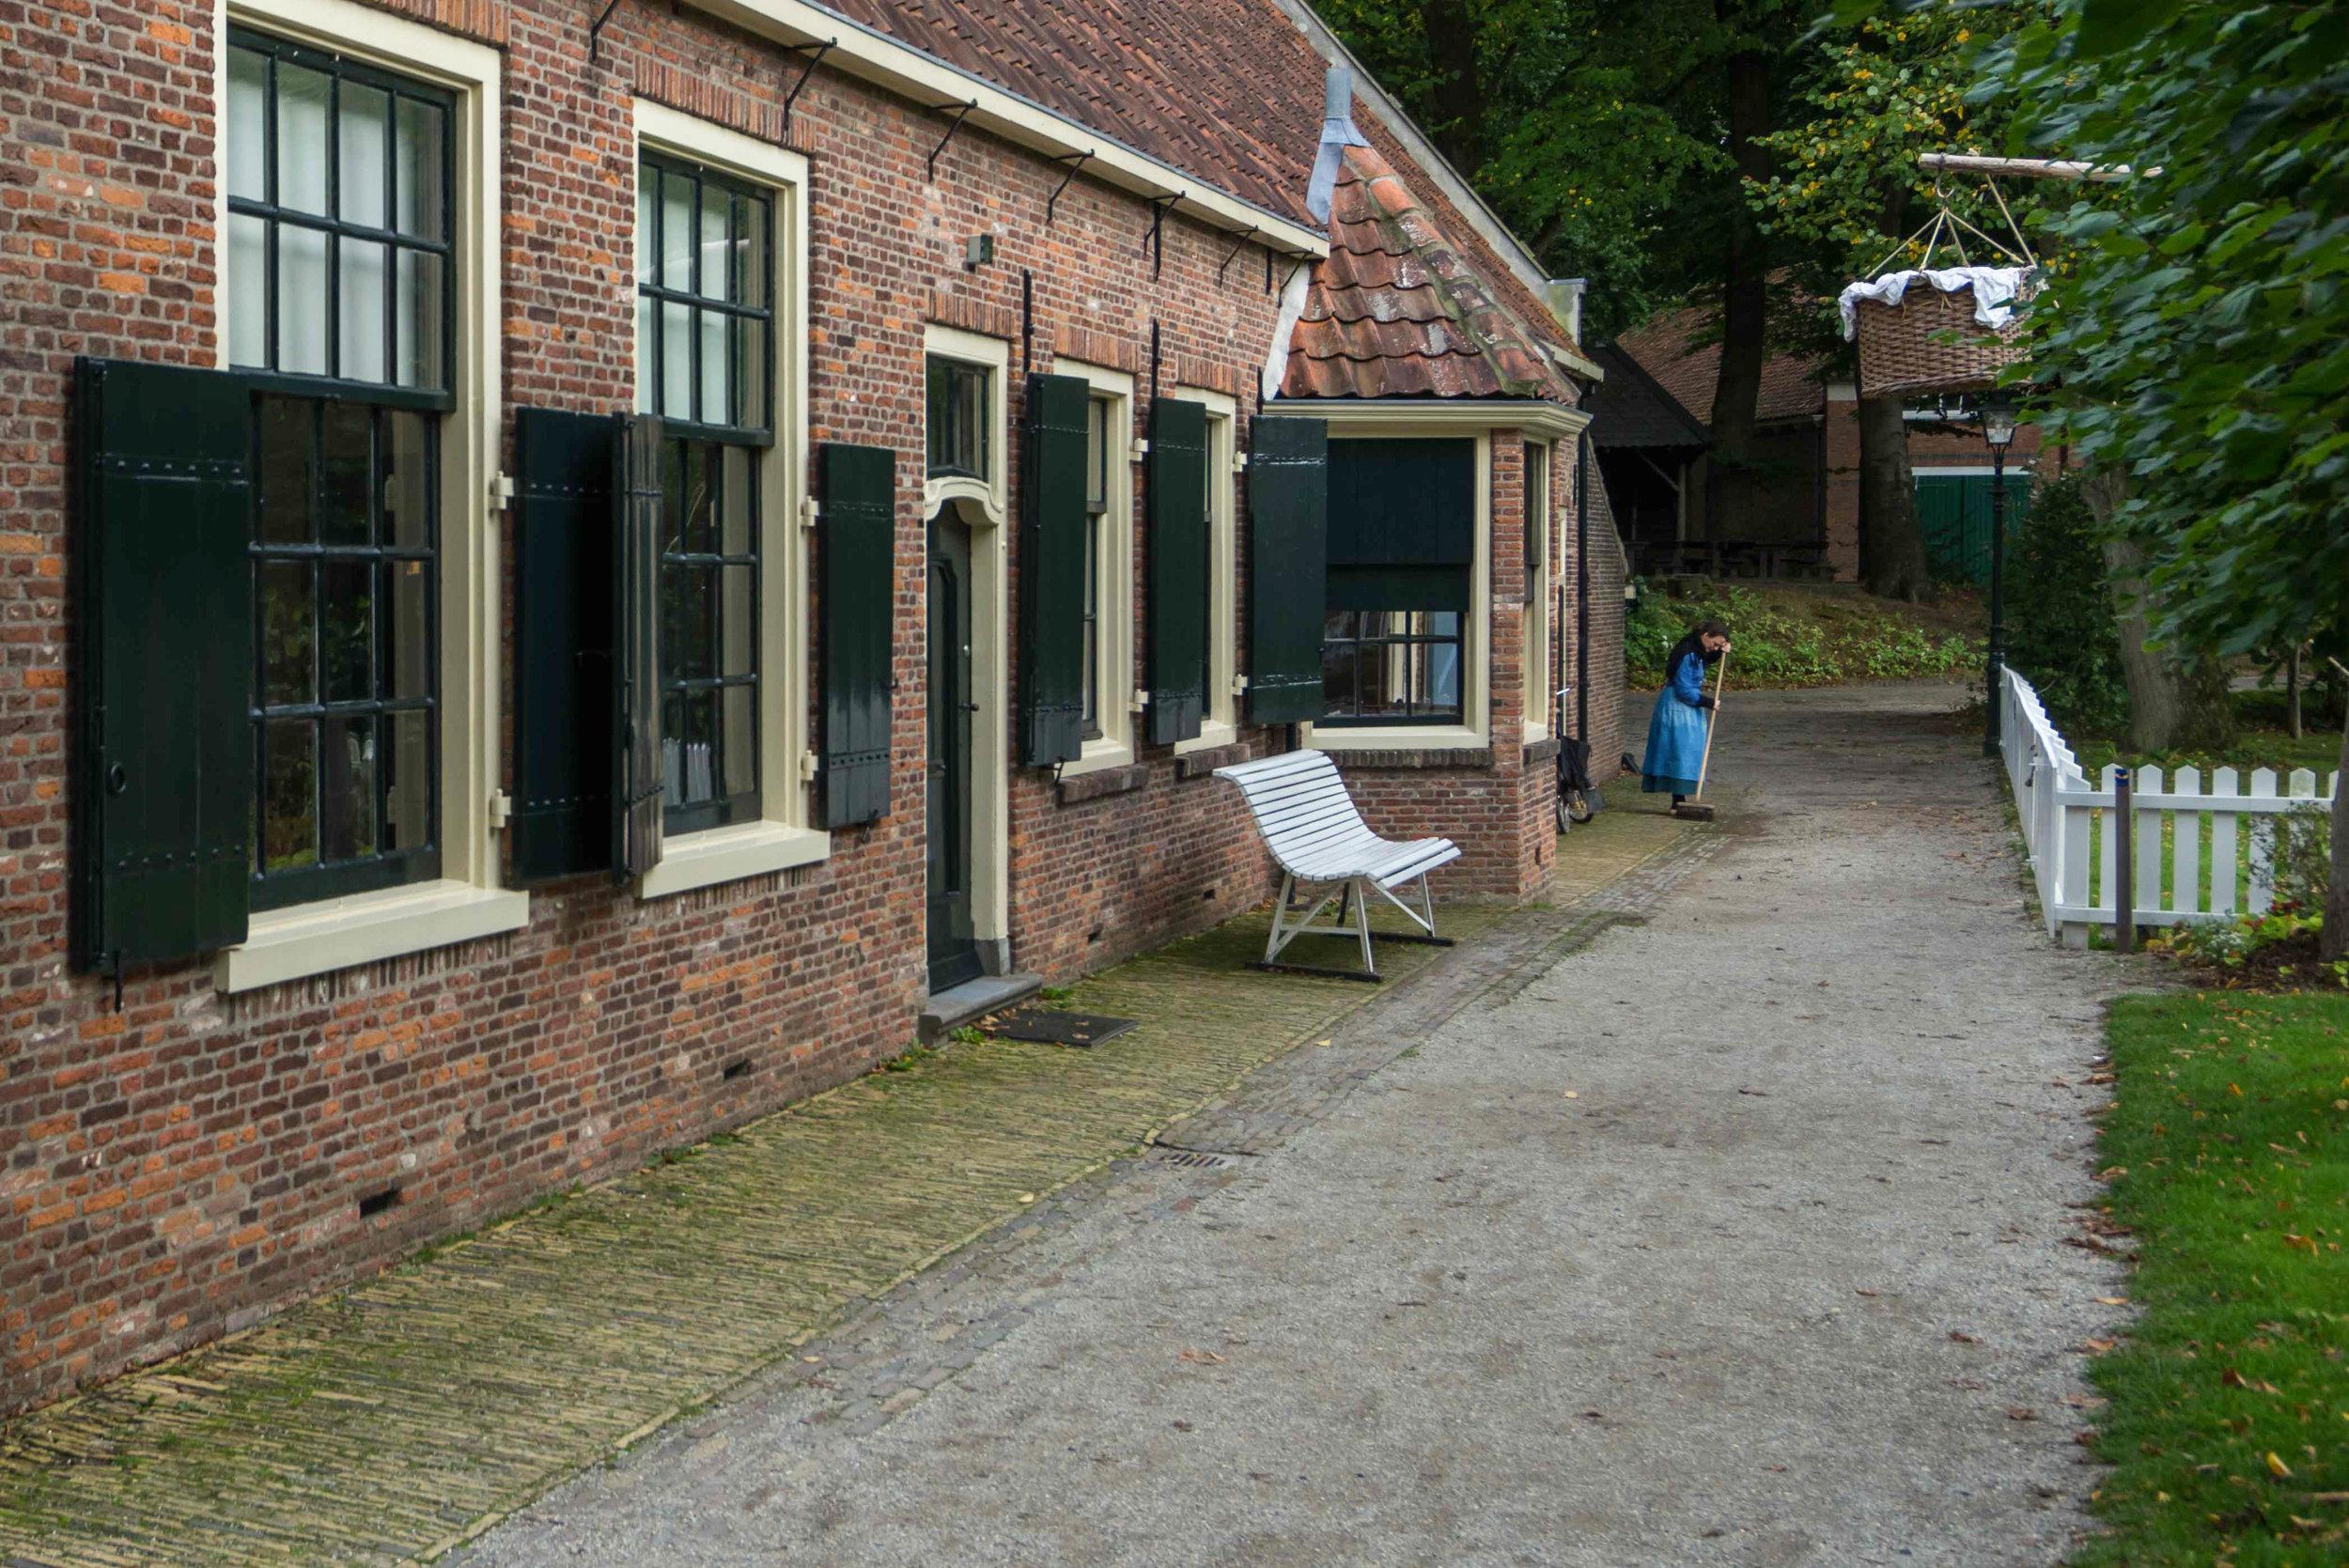 Nederland 10-01-2017 Dev LR-146.jpg